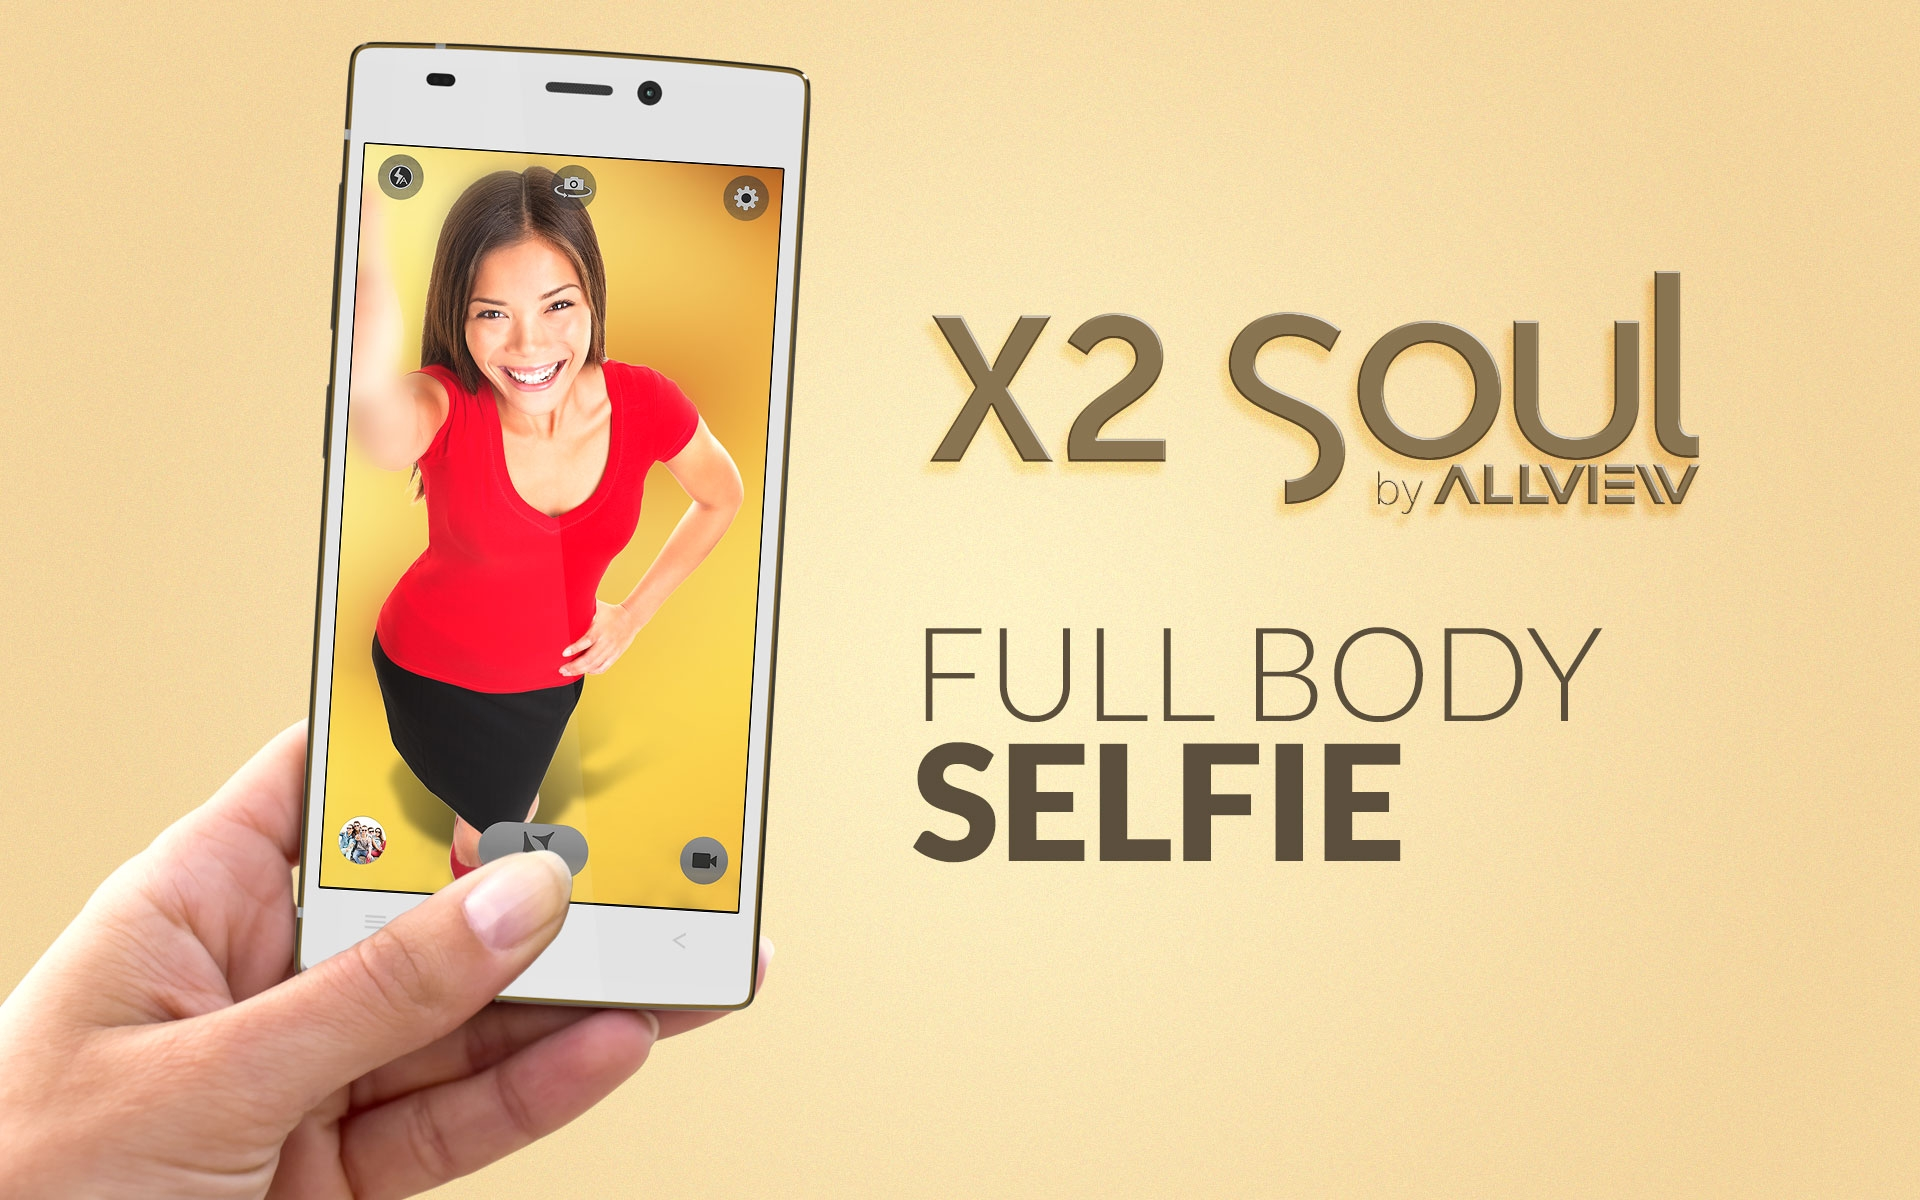 x2-soul-full-body-selfie